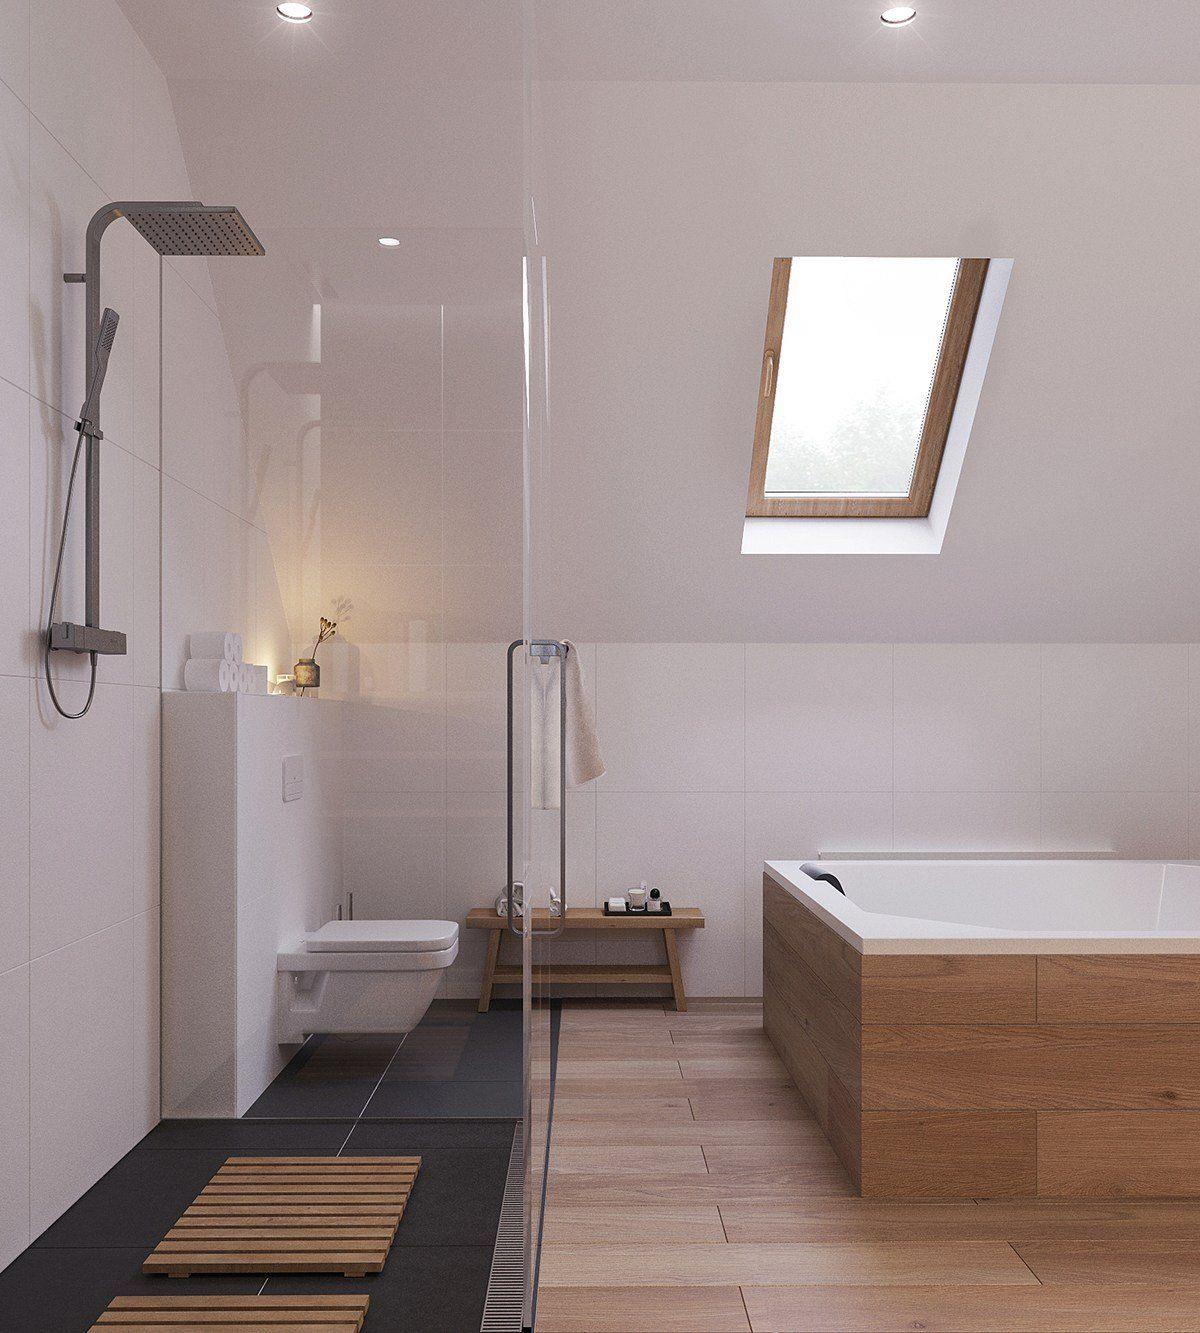 Originale Appartamento Stile Scandinavo Moderno Design Nordico Unico Ed Elegante Bad Inspiration Badezimmer Dachgeschoss Design Fur Zuhause